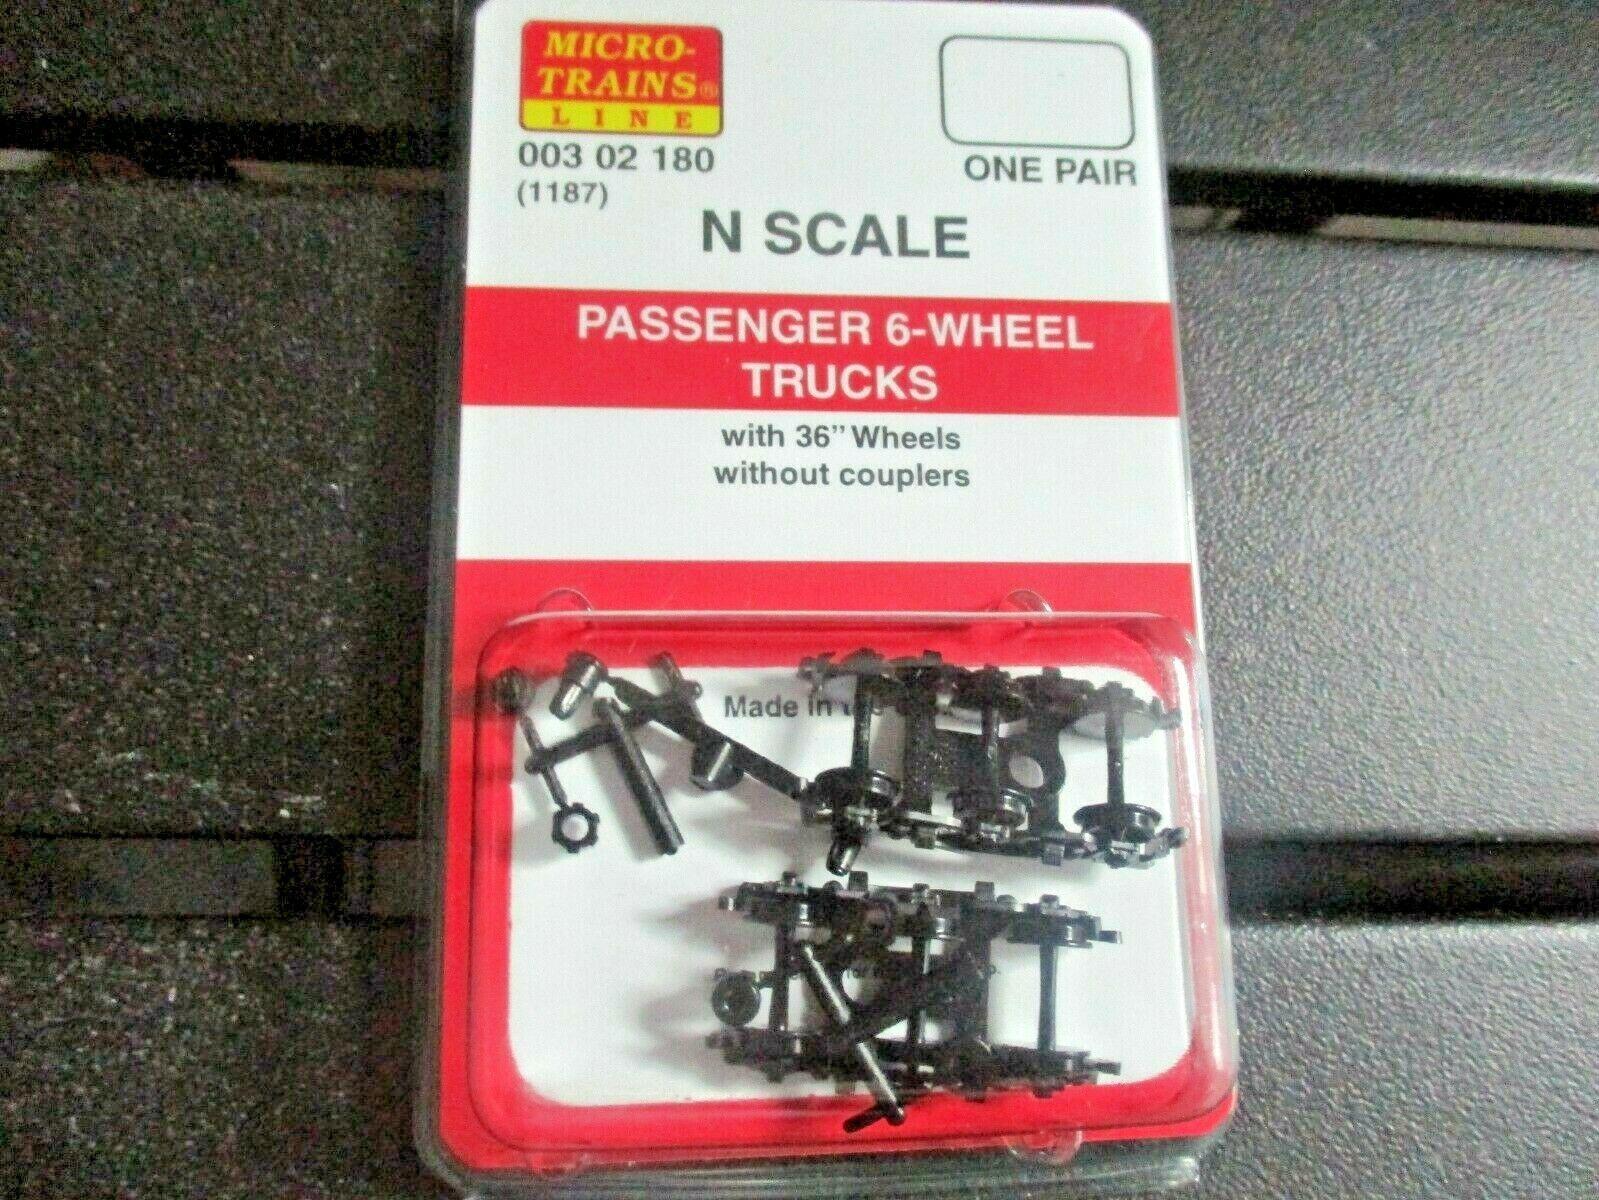 Micro-Trains Stock # 00302180 (1187) Passenger 6-Wheel Trucks No Couplers (N)